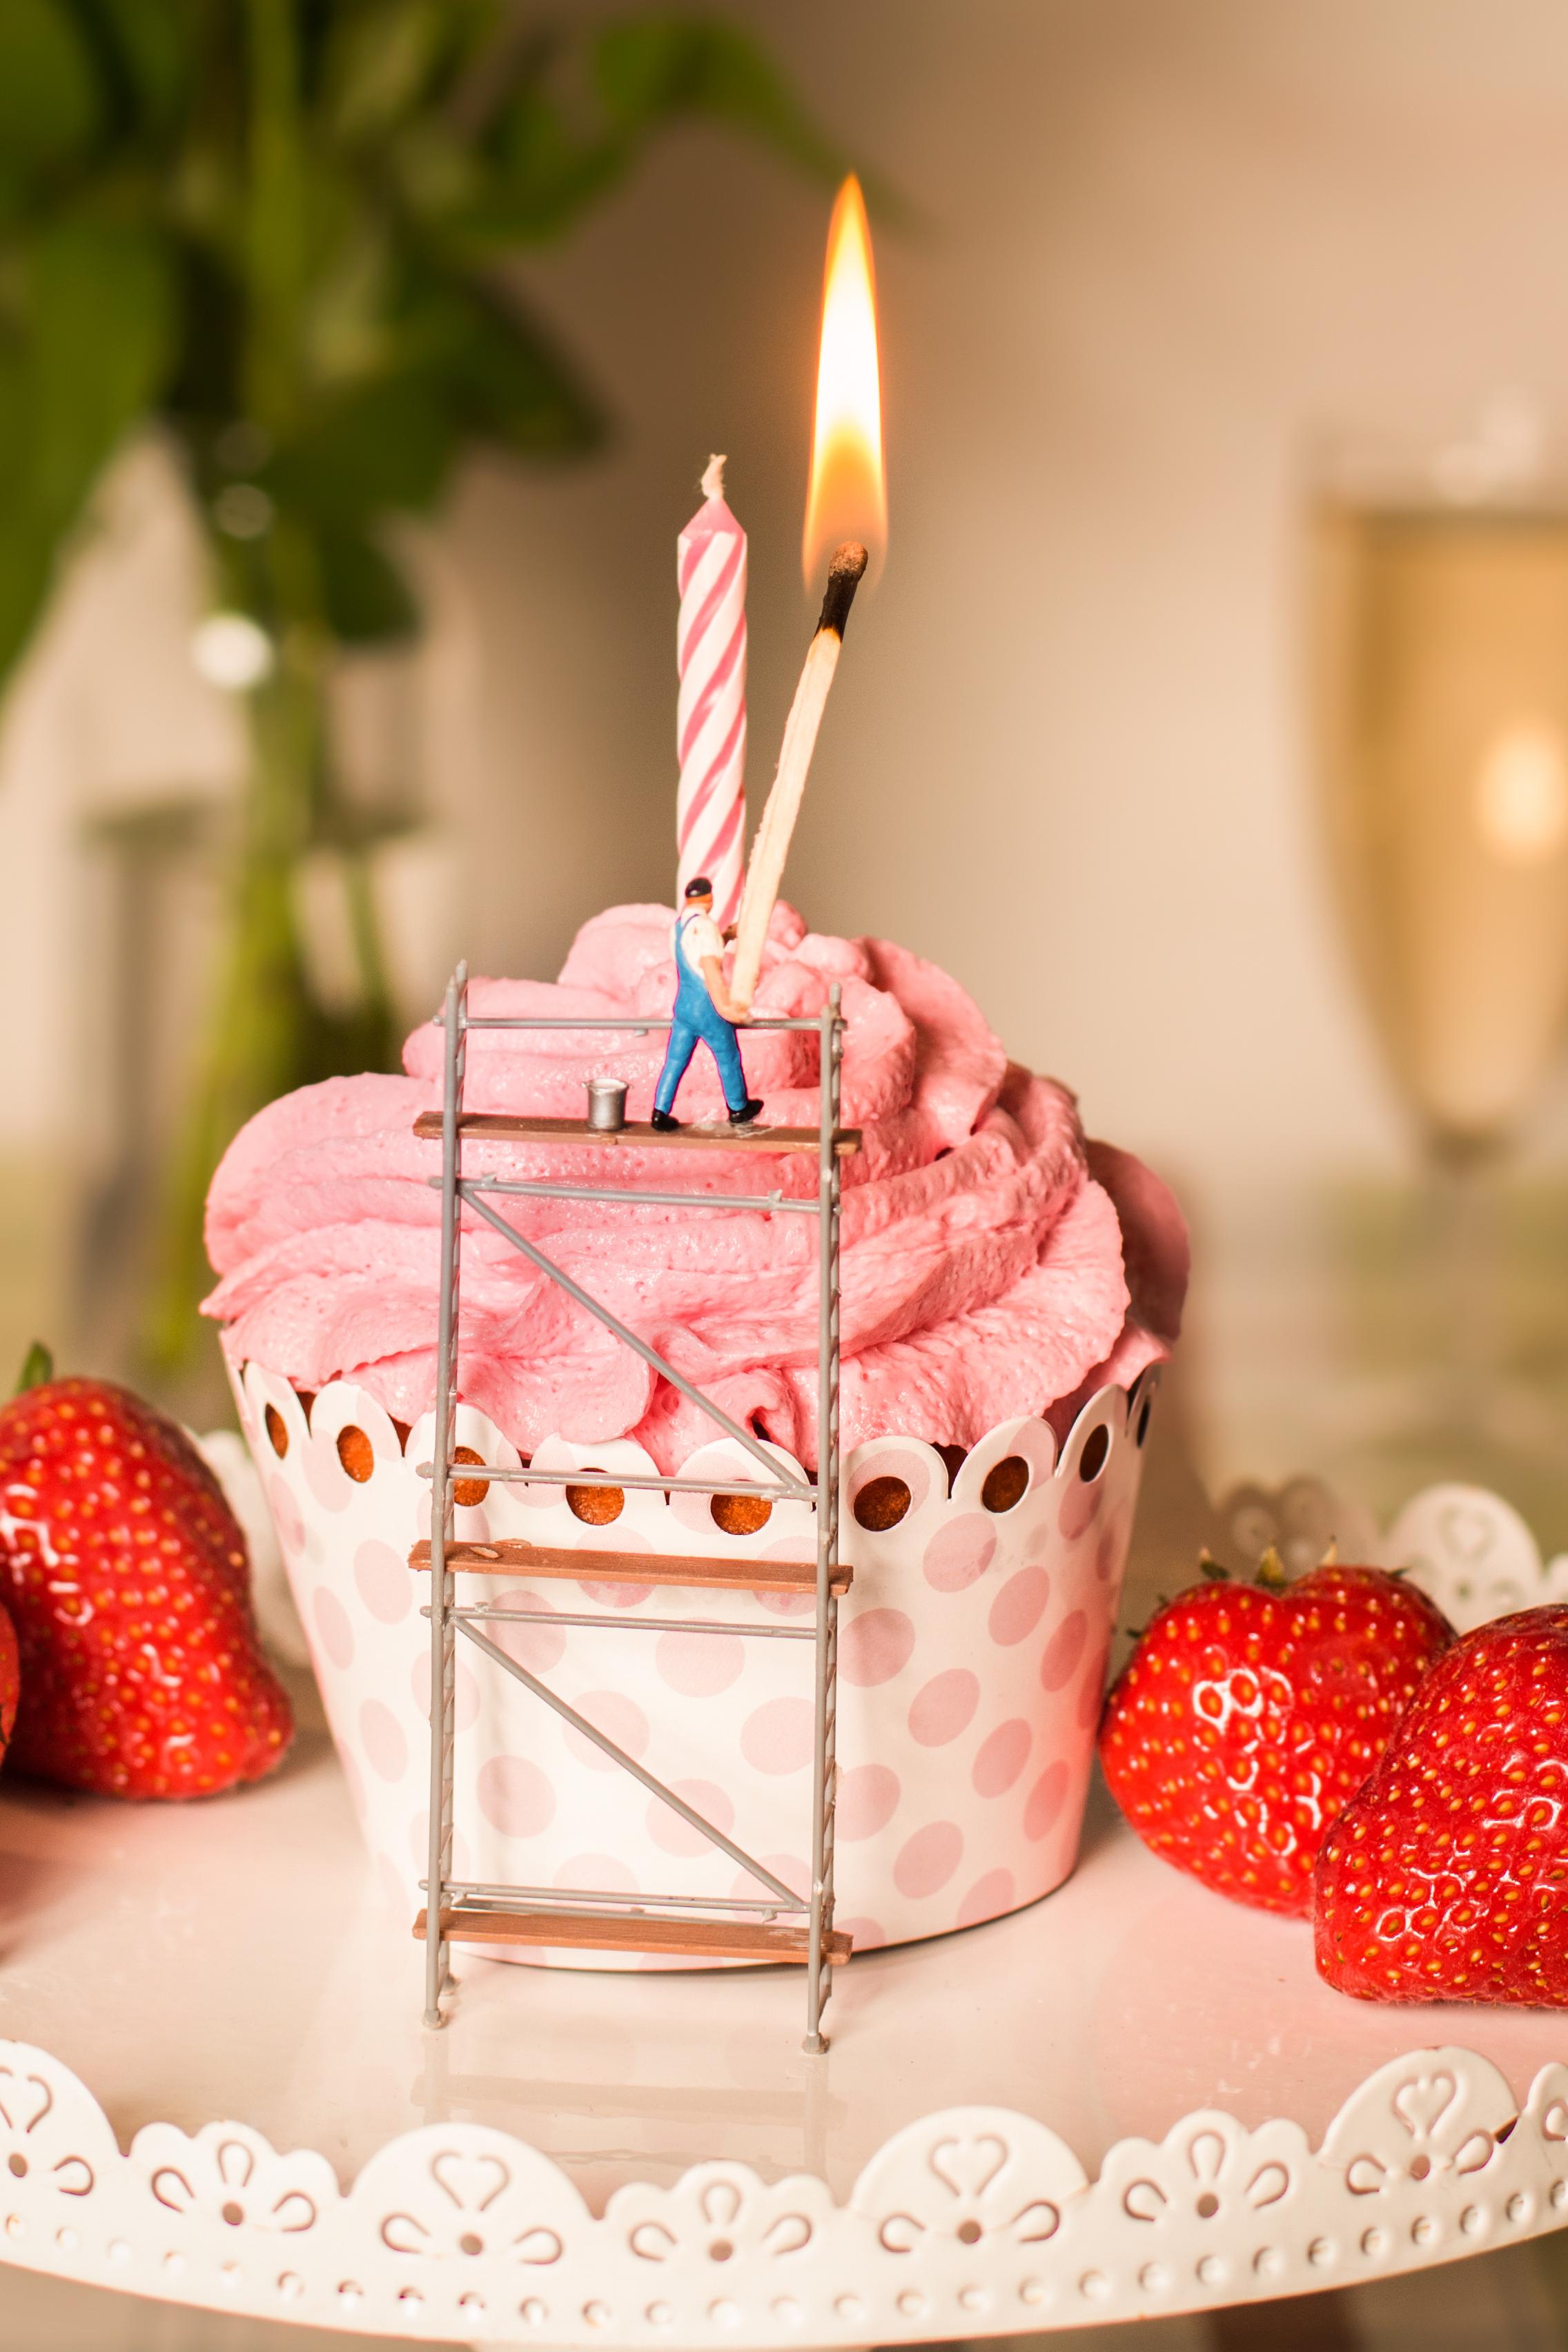 Geburtstag 6